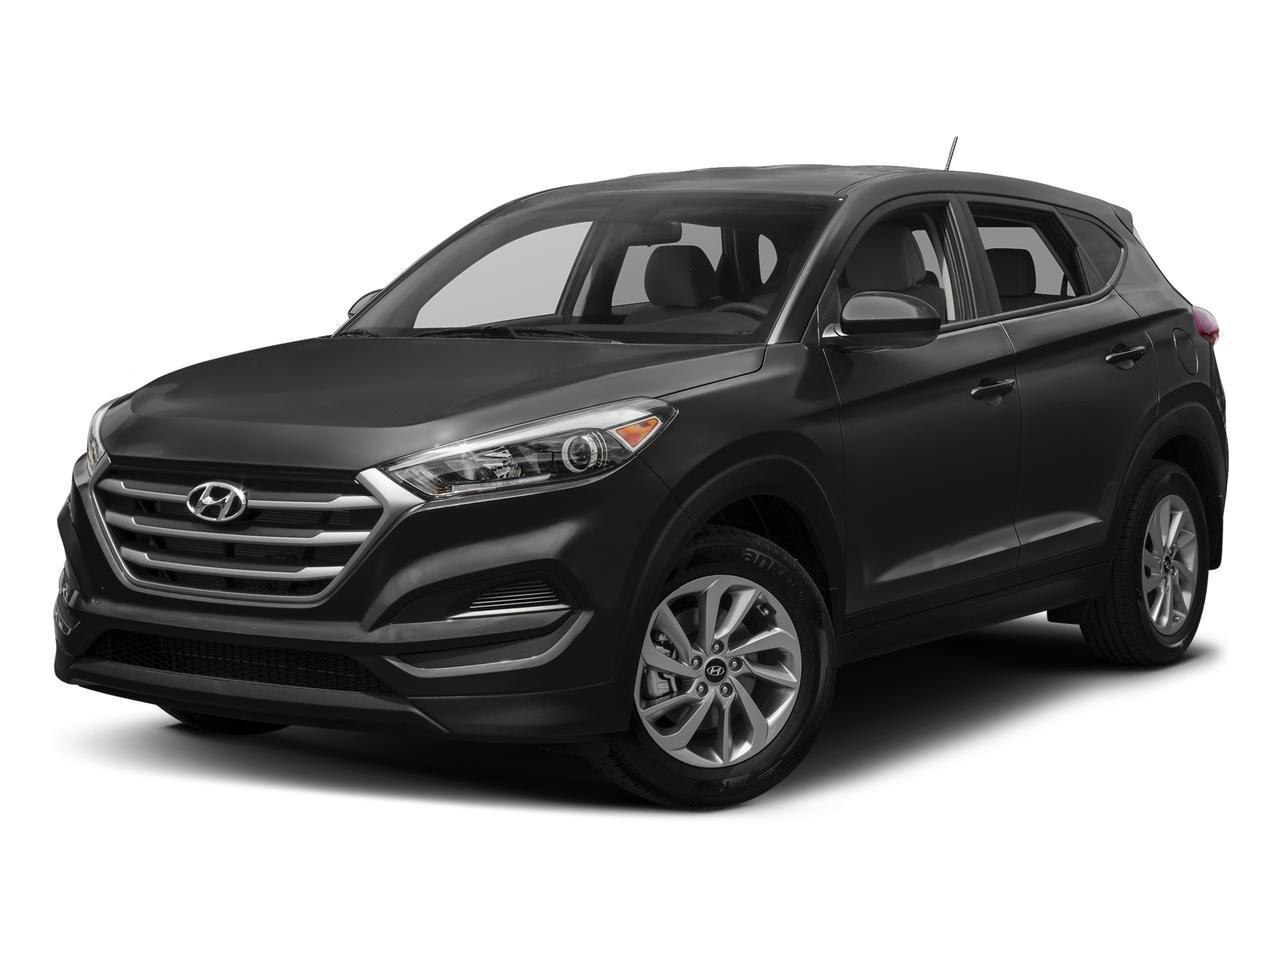 2017 Hyundai Tucson Vehicle Photo in Plainfield, IL 60586